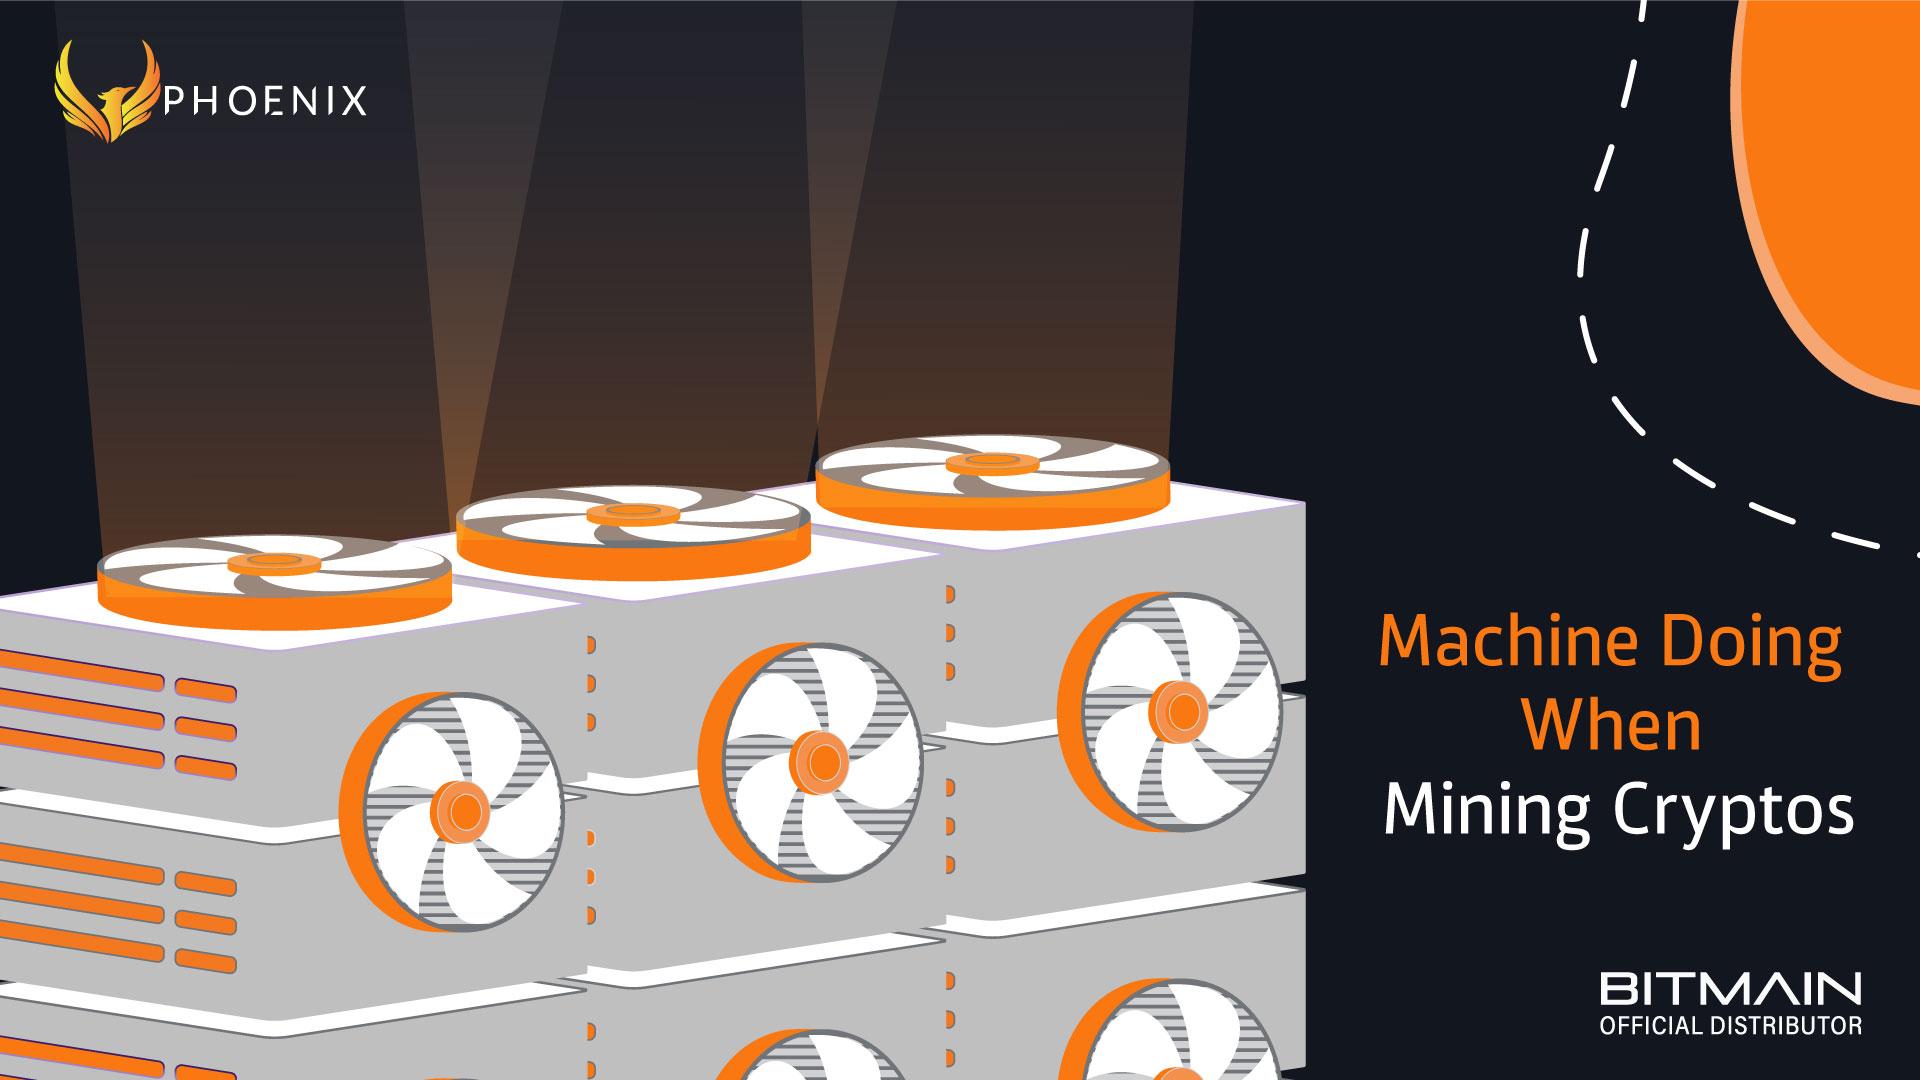 Mining Cryptos